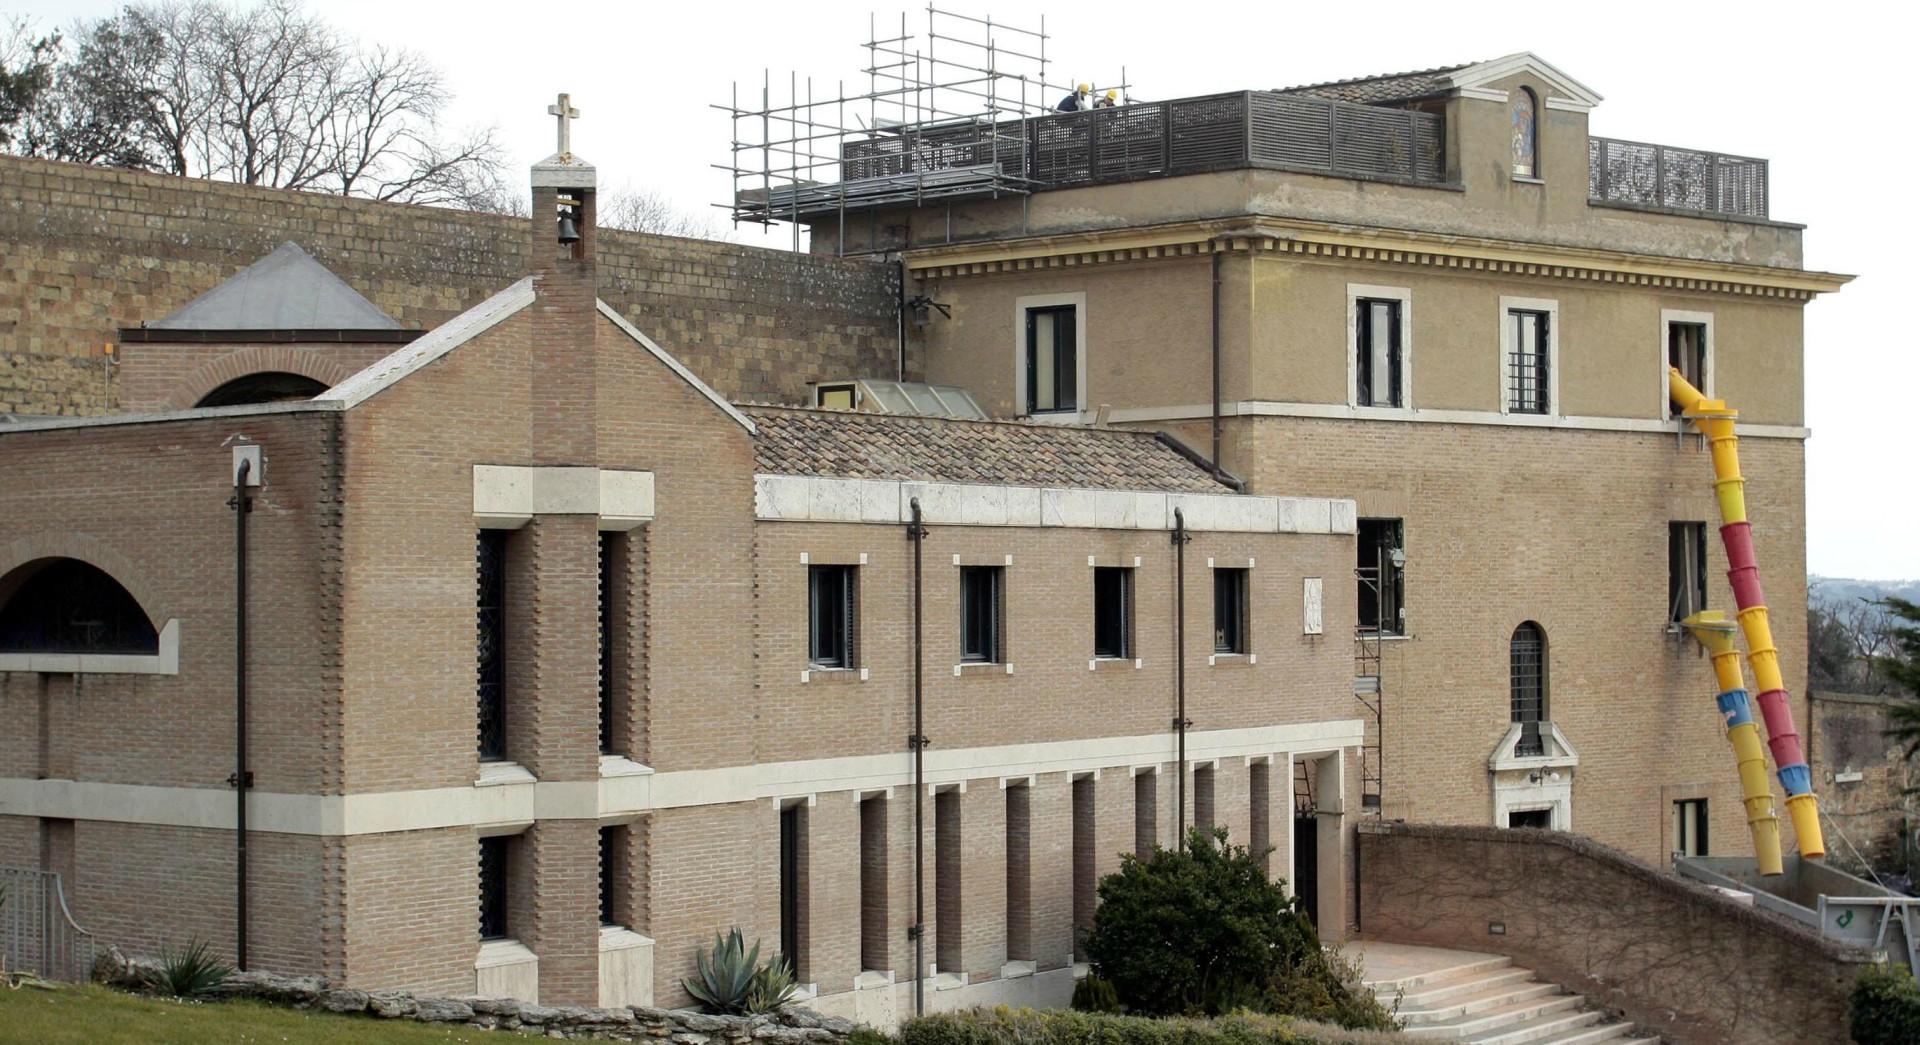 Le Vatican M U00e9connu  Le Monast U00e8re Mater Ecclesiae